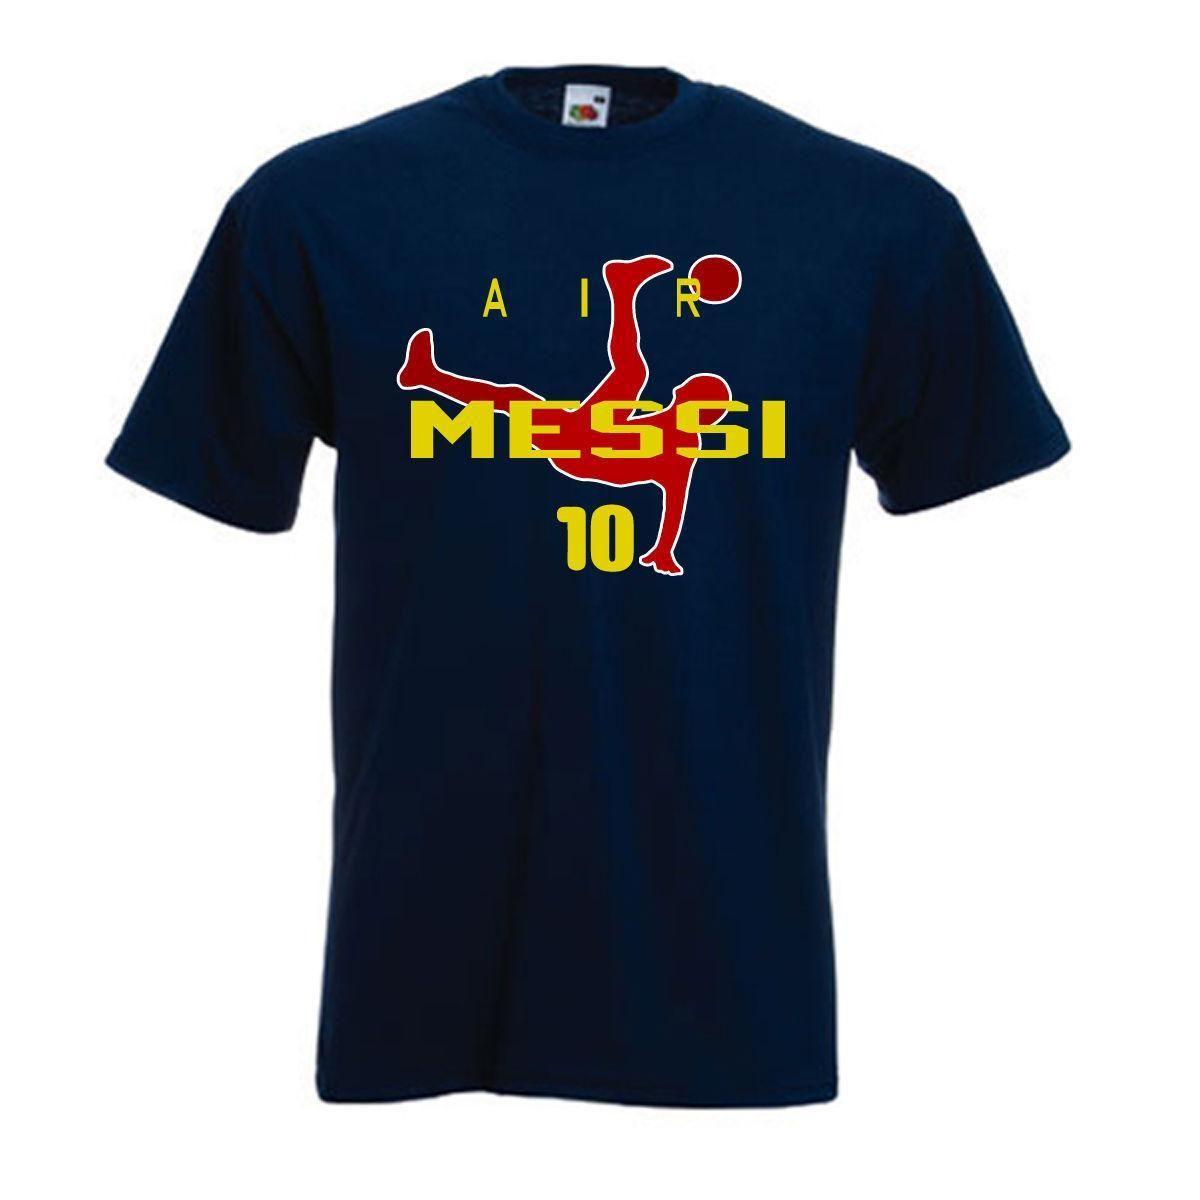 06da46653 Lionel Messi FC Barcelona Air Messi Soccer World Cup Jersey T Shirt ...